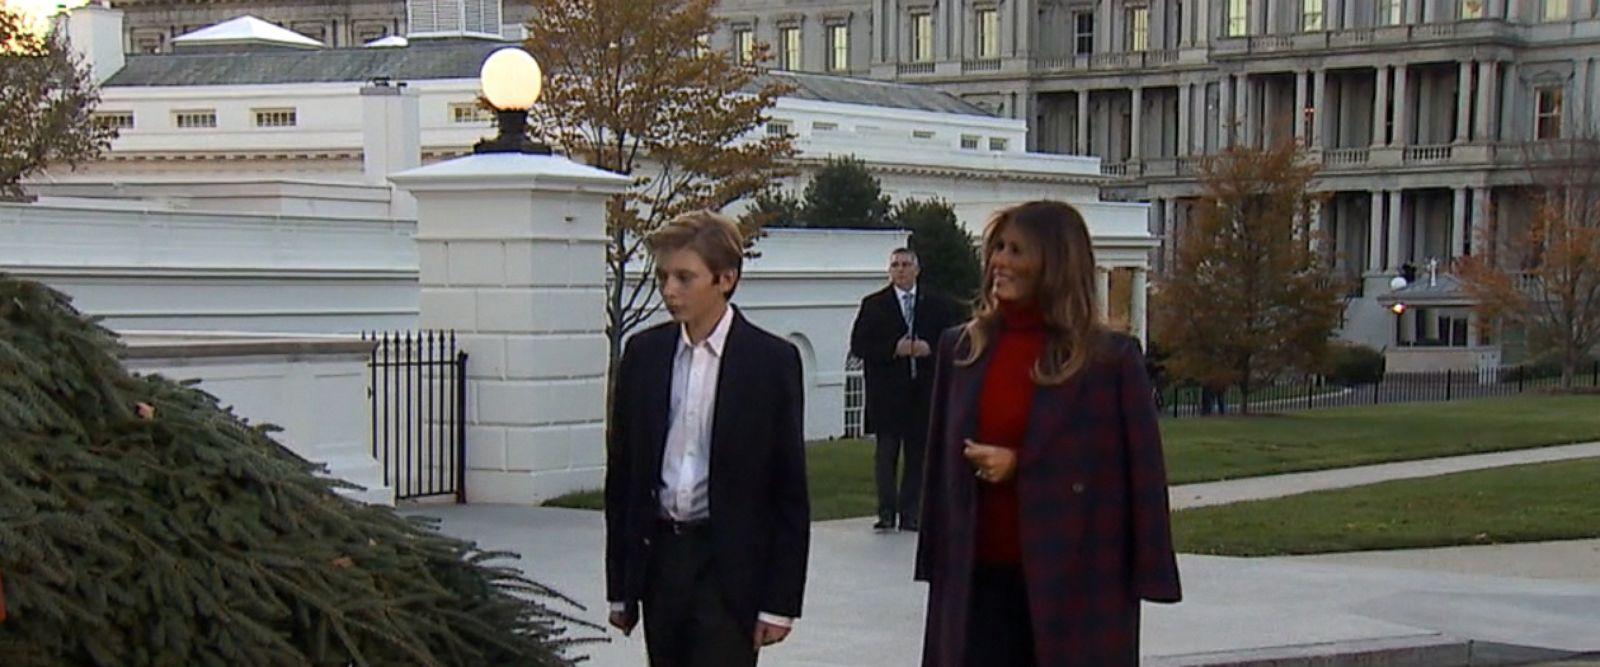 VIDEO: DC decks the halls!